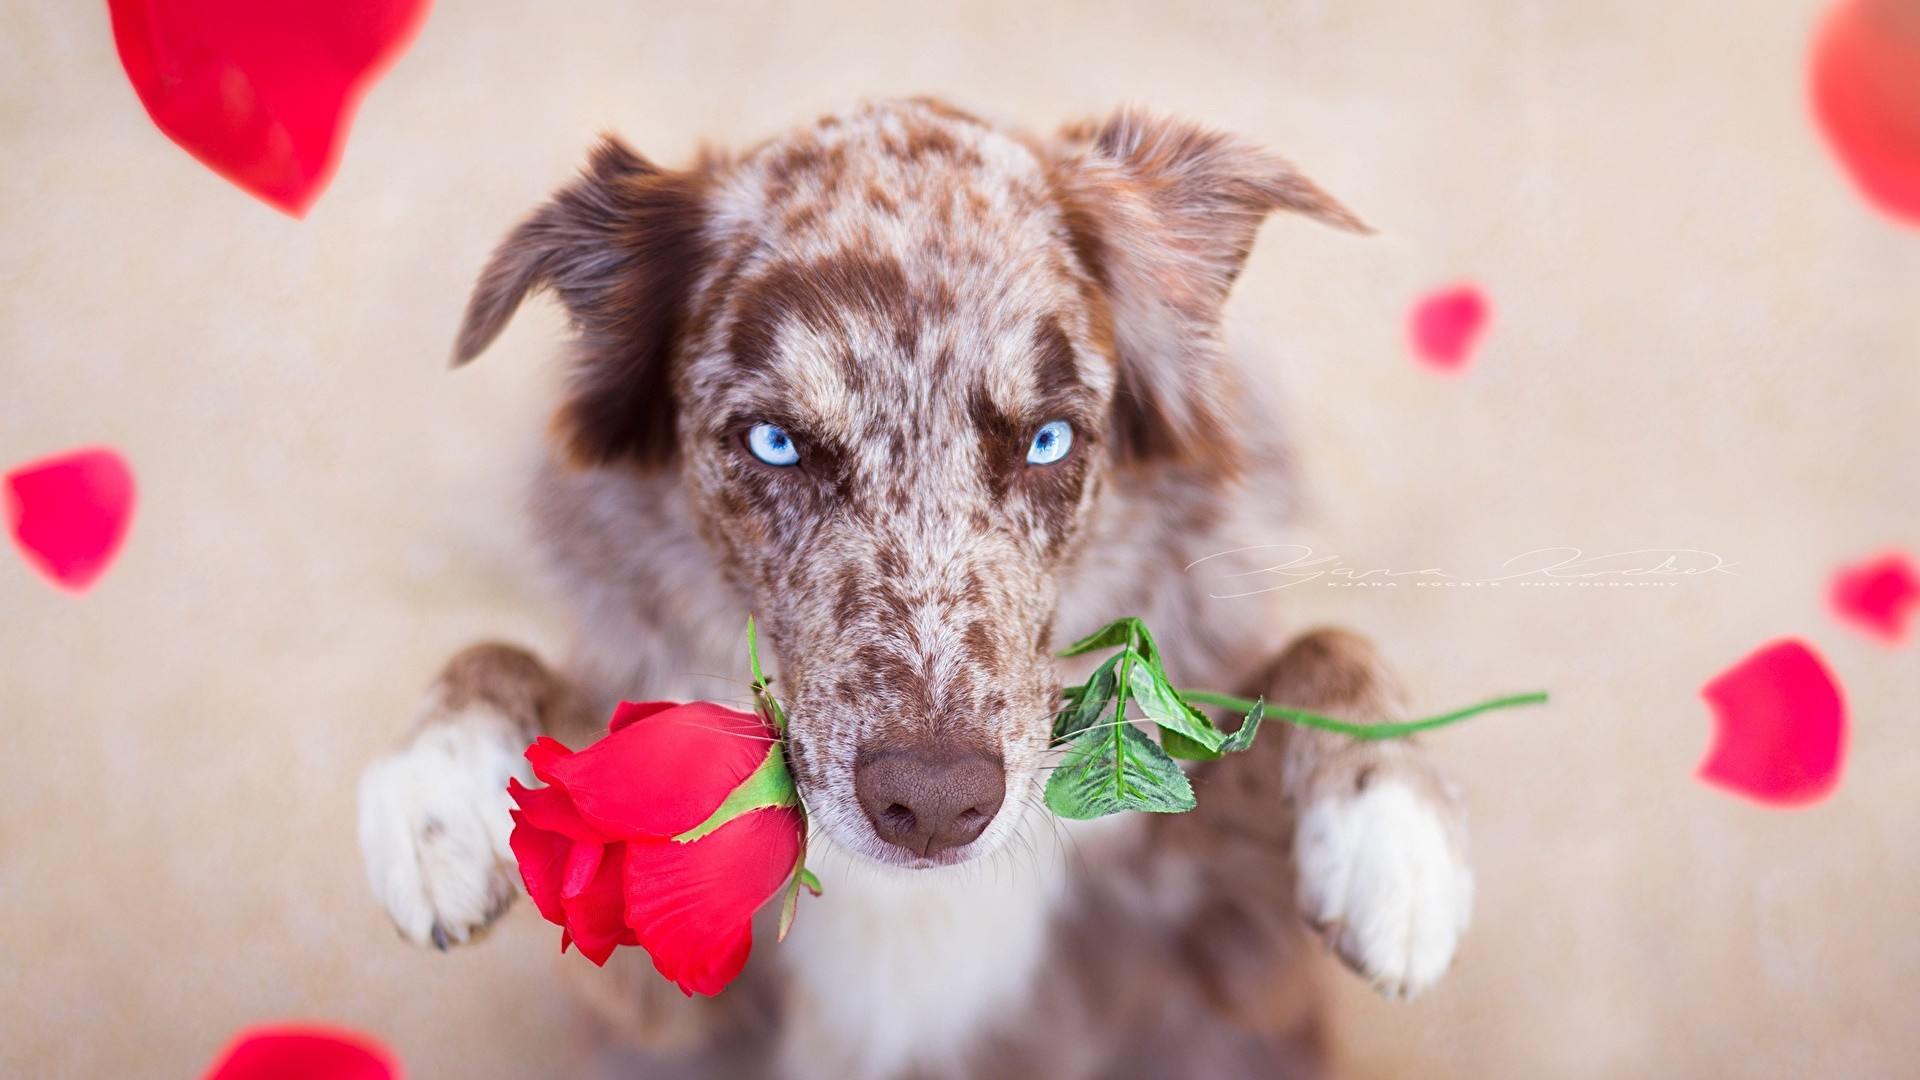 Cute Women's Day image hd